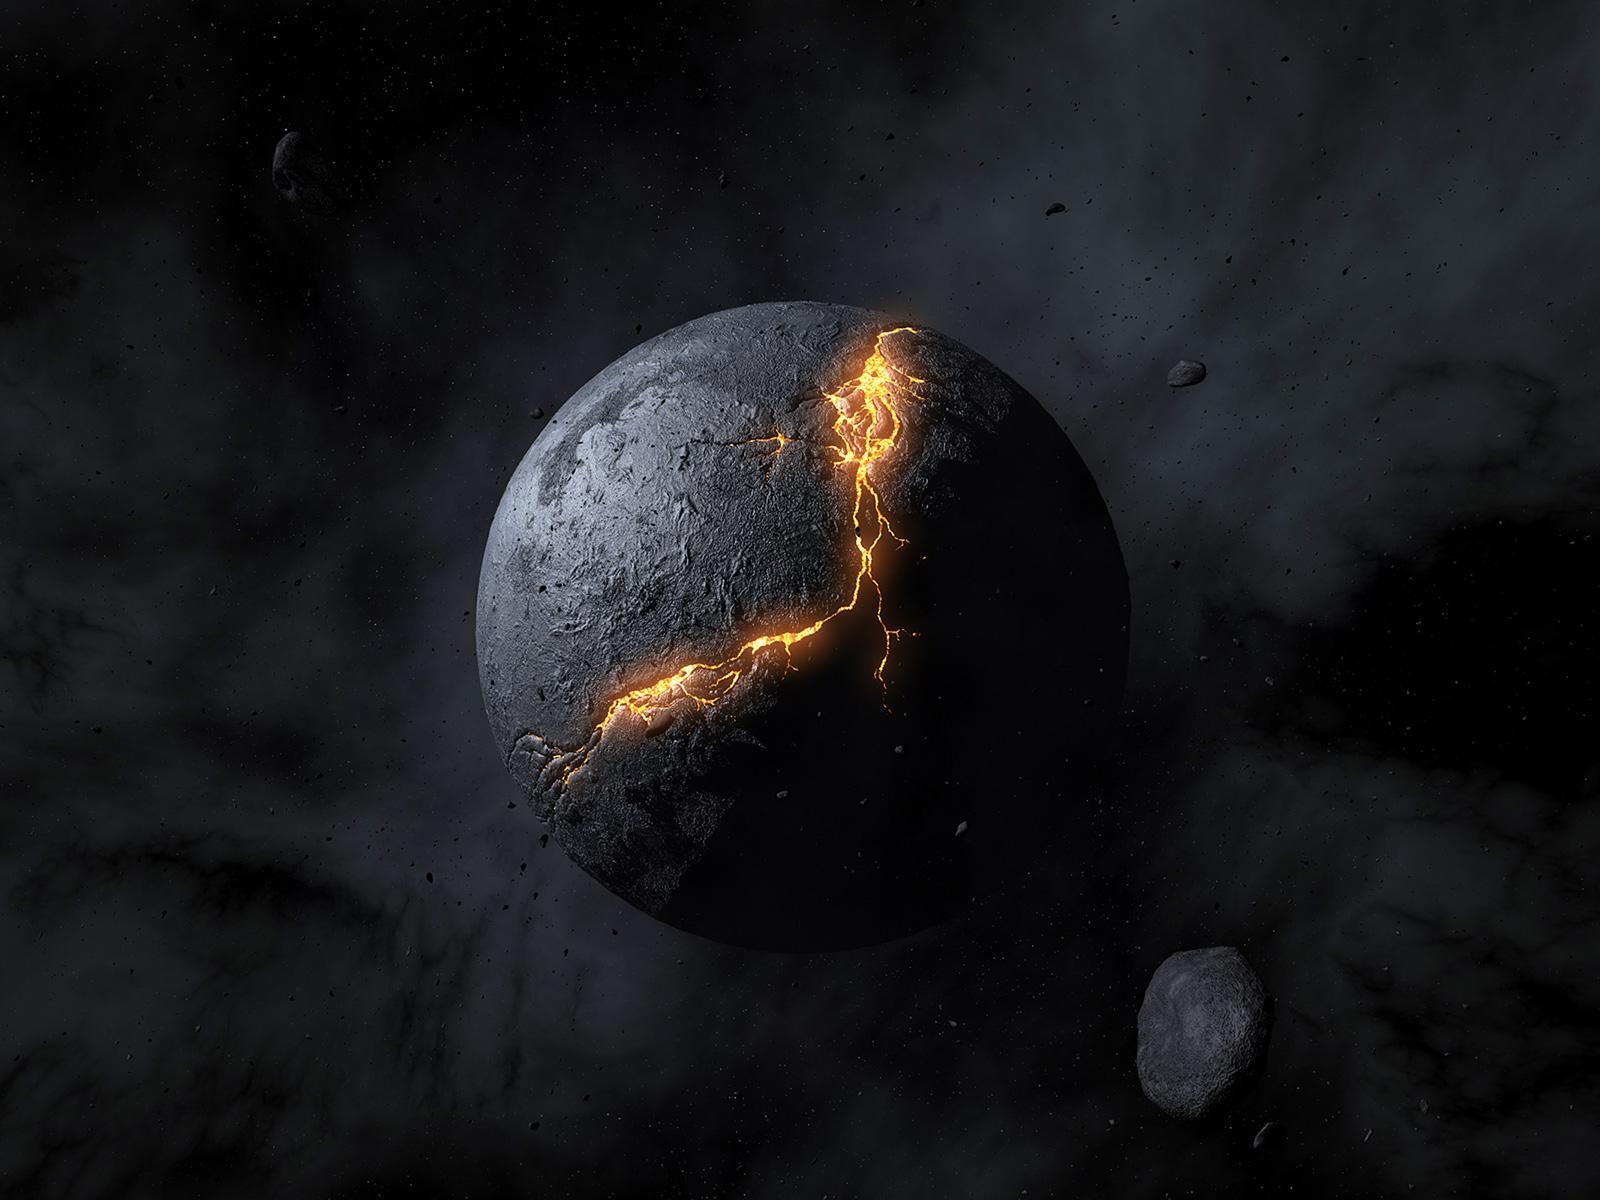 http://4.bp.blogspot.com/-TXRFpOJ91Ks/UCiGFSrQirI/AAAAAAAAEzU/geFK_ygVb0A/s1600/Eruption+on+other+Planet.jpg